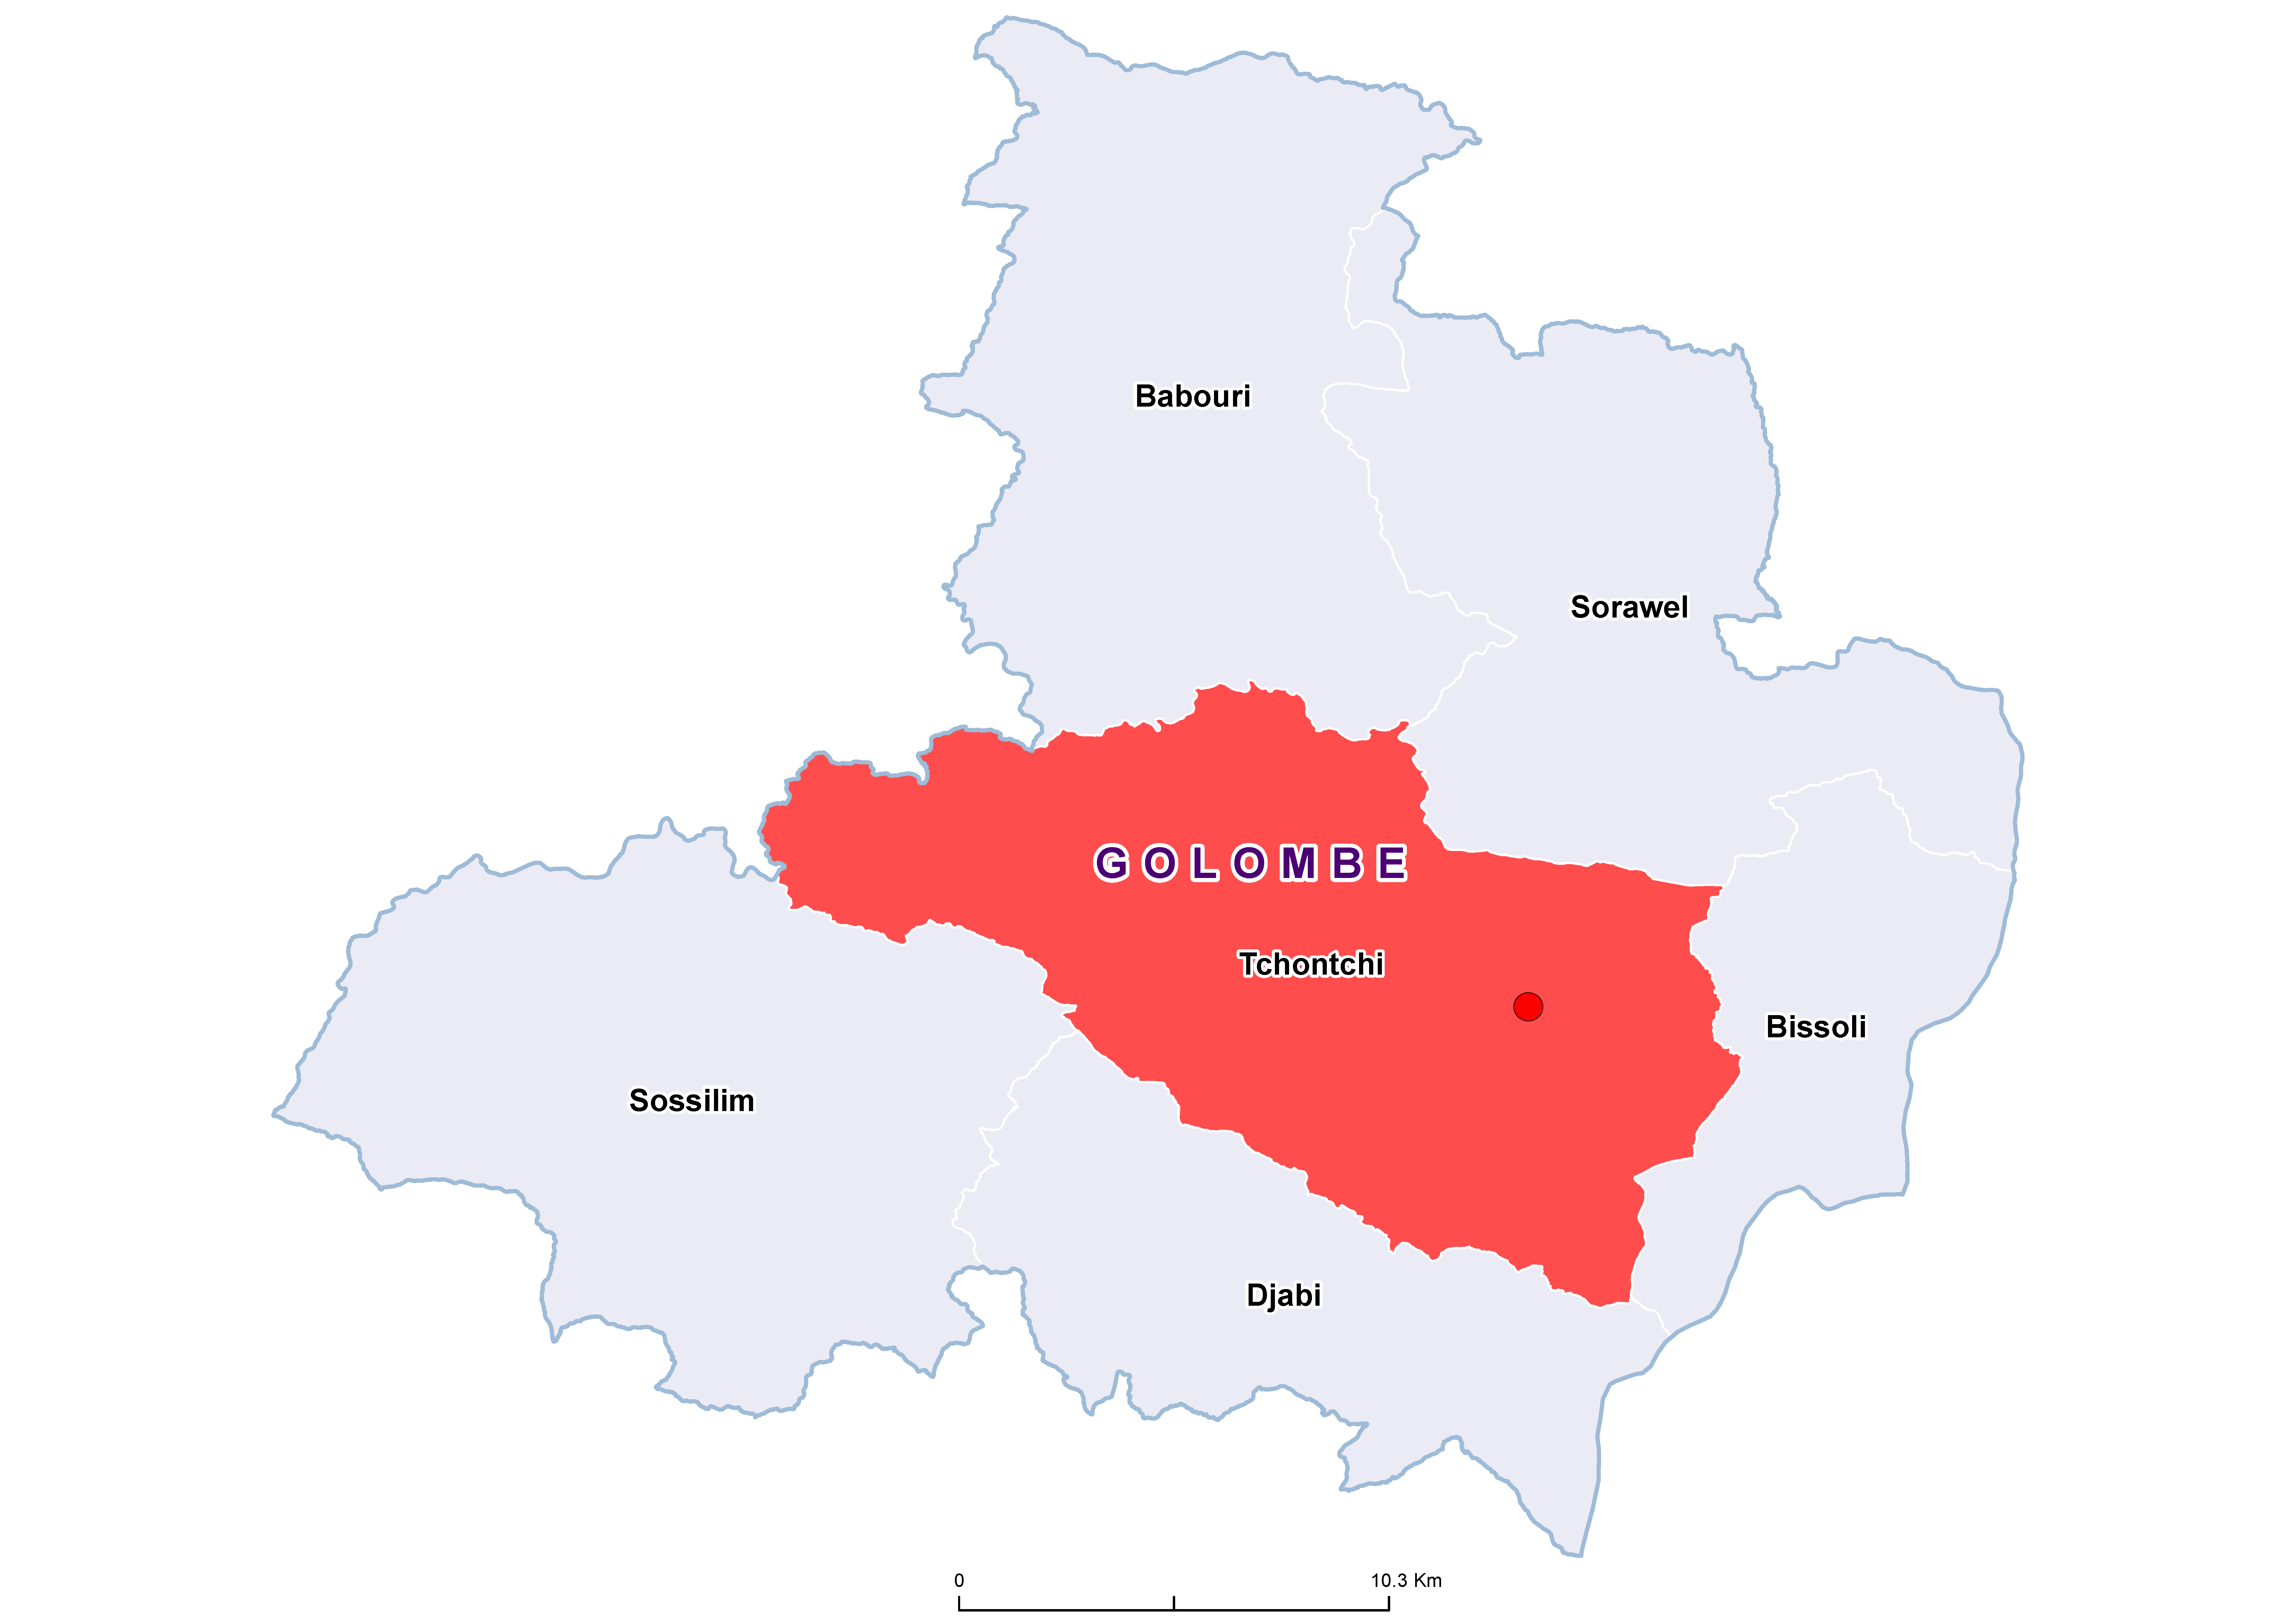 Golombe SCH 19850001